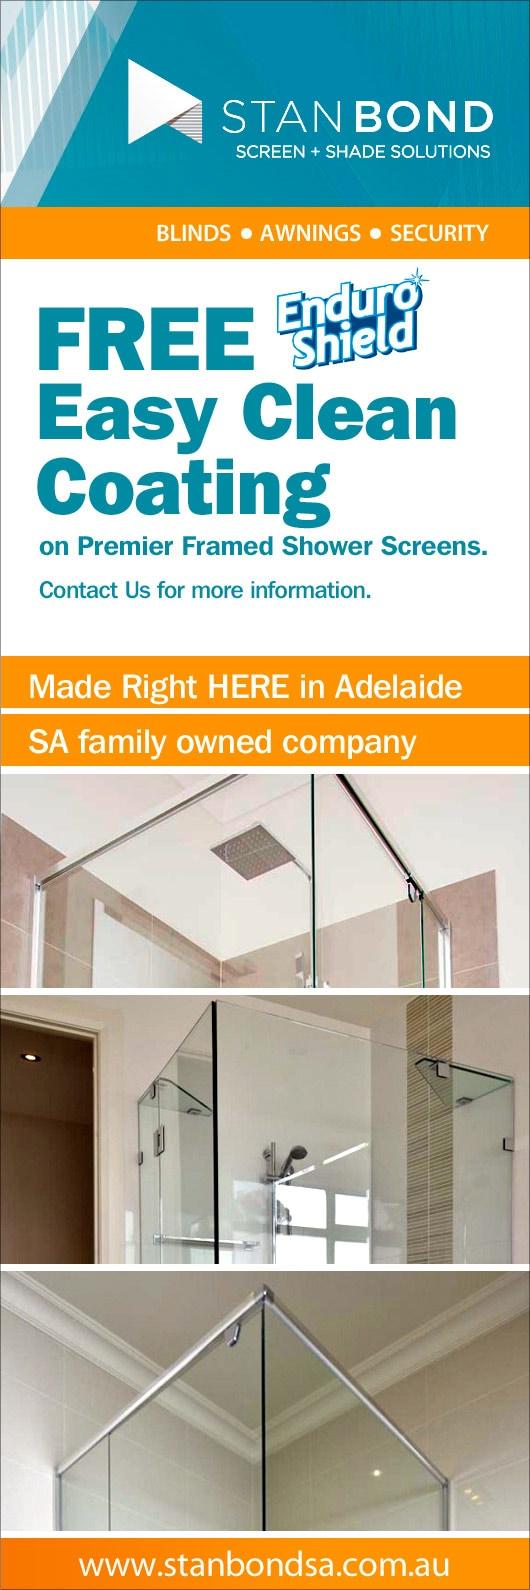 Stan Bond SA Pty Ltd - Shower Screens - PARKSIDE